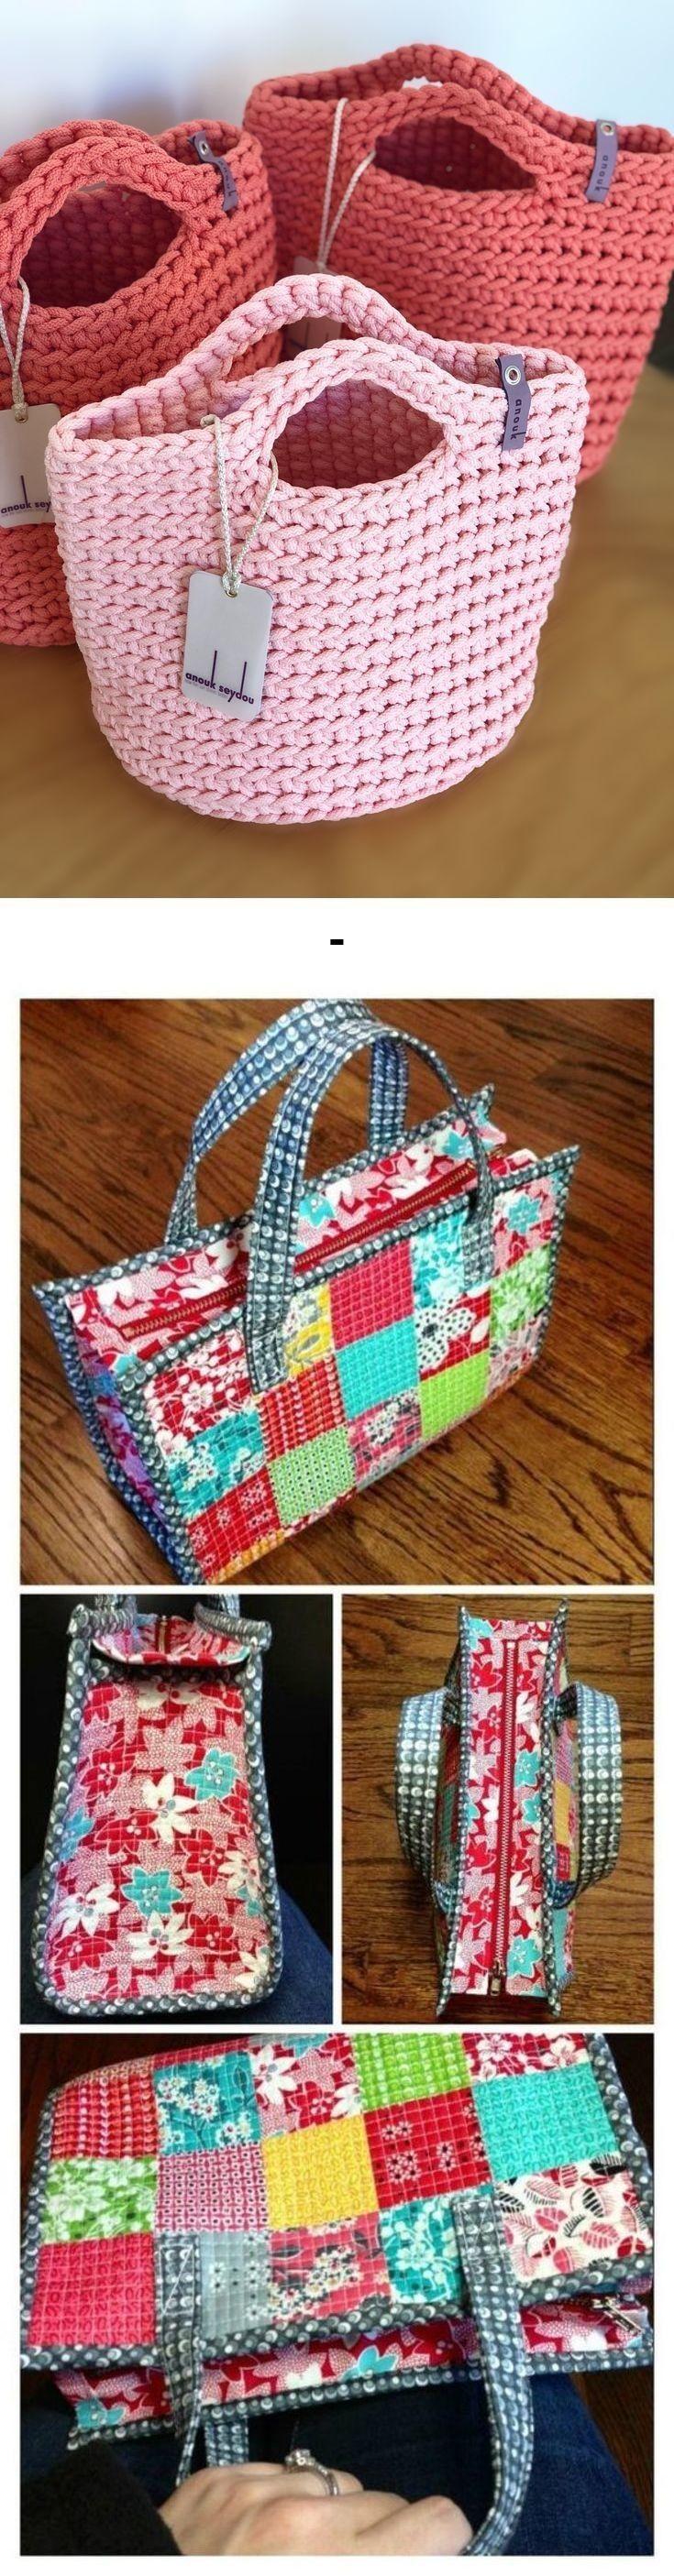 Cool way on how to make a tshirt tote bag diy tote bag